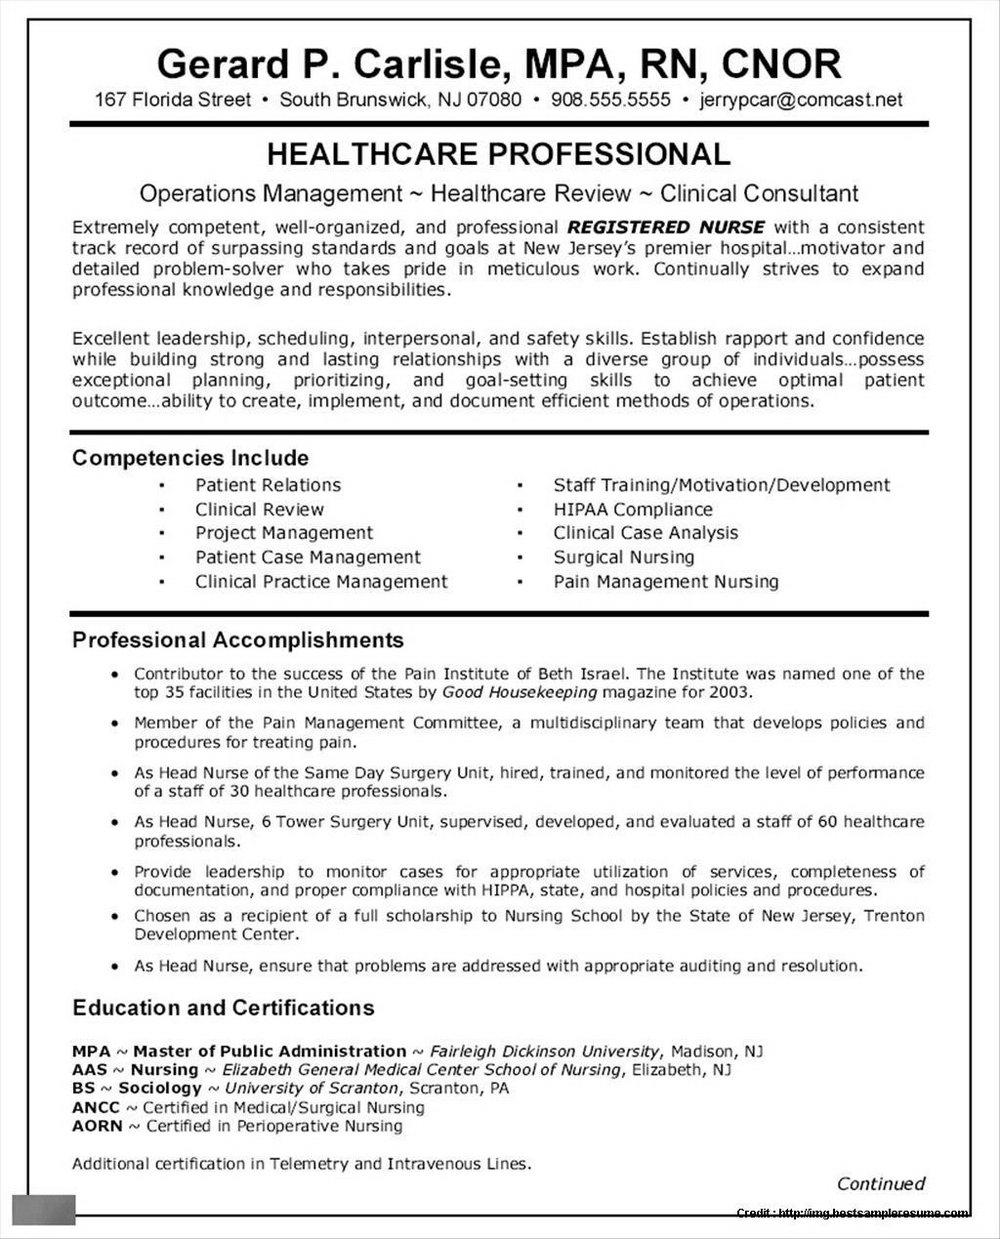 Application For Nursing Job Sample